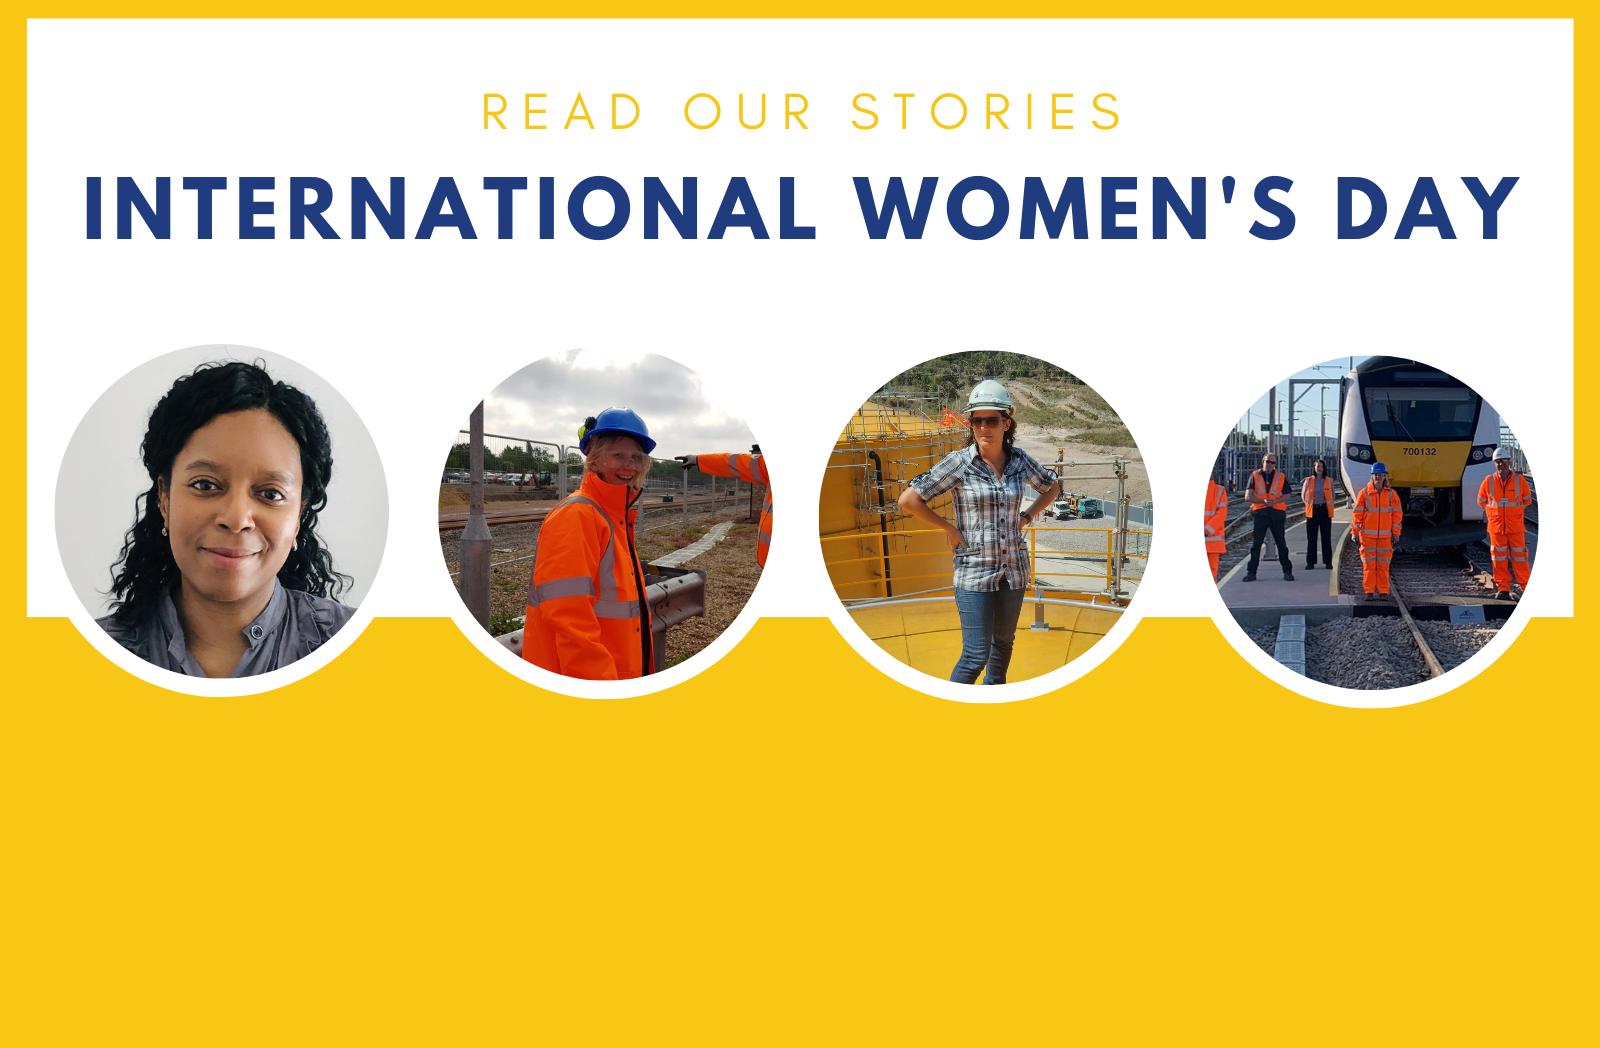 The four women featured in our 2021 International Women's Day story: Angela Latty, Karen Mercer, Isa Ribeiro, and Sam Wadsworth